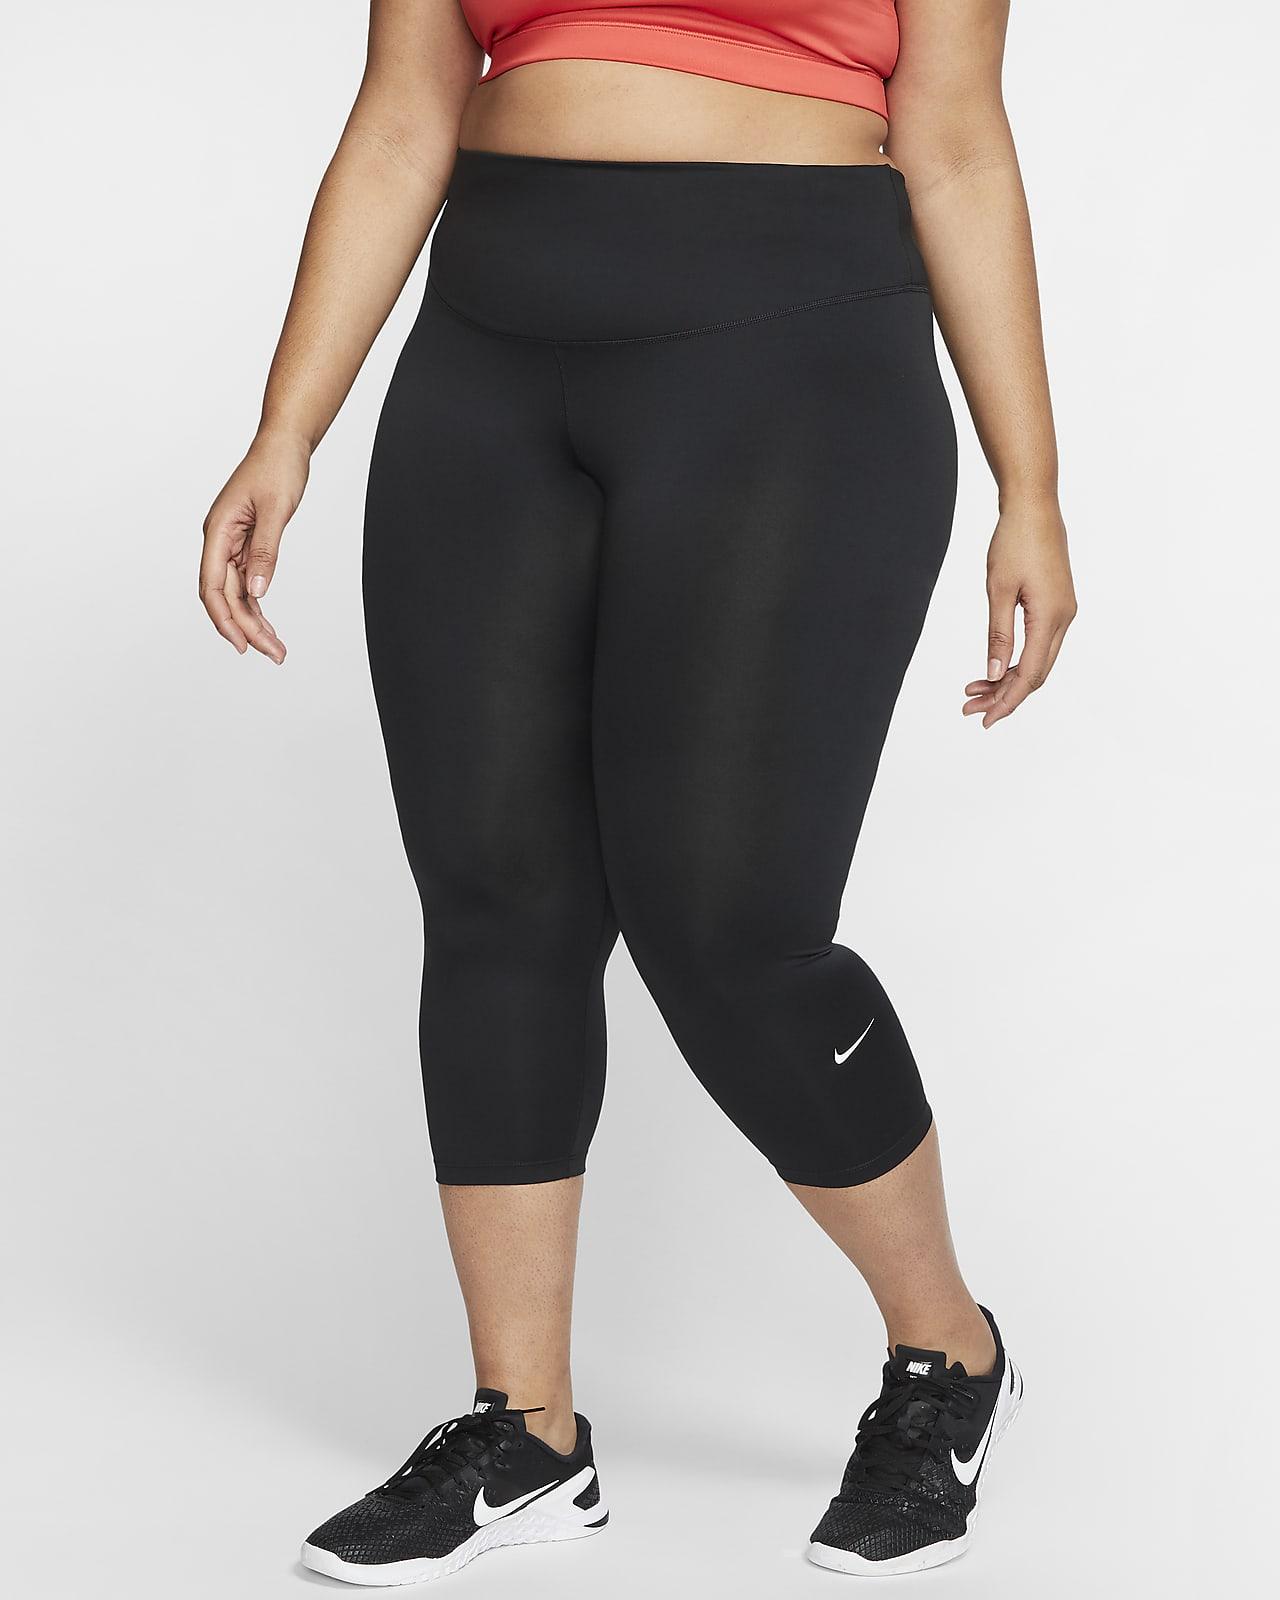 Korta leggings Nike One för kvinnor (Plus Size)